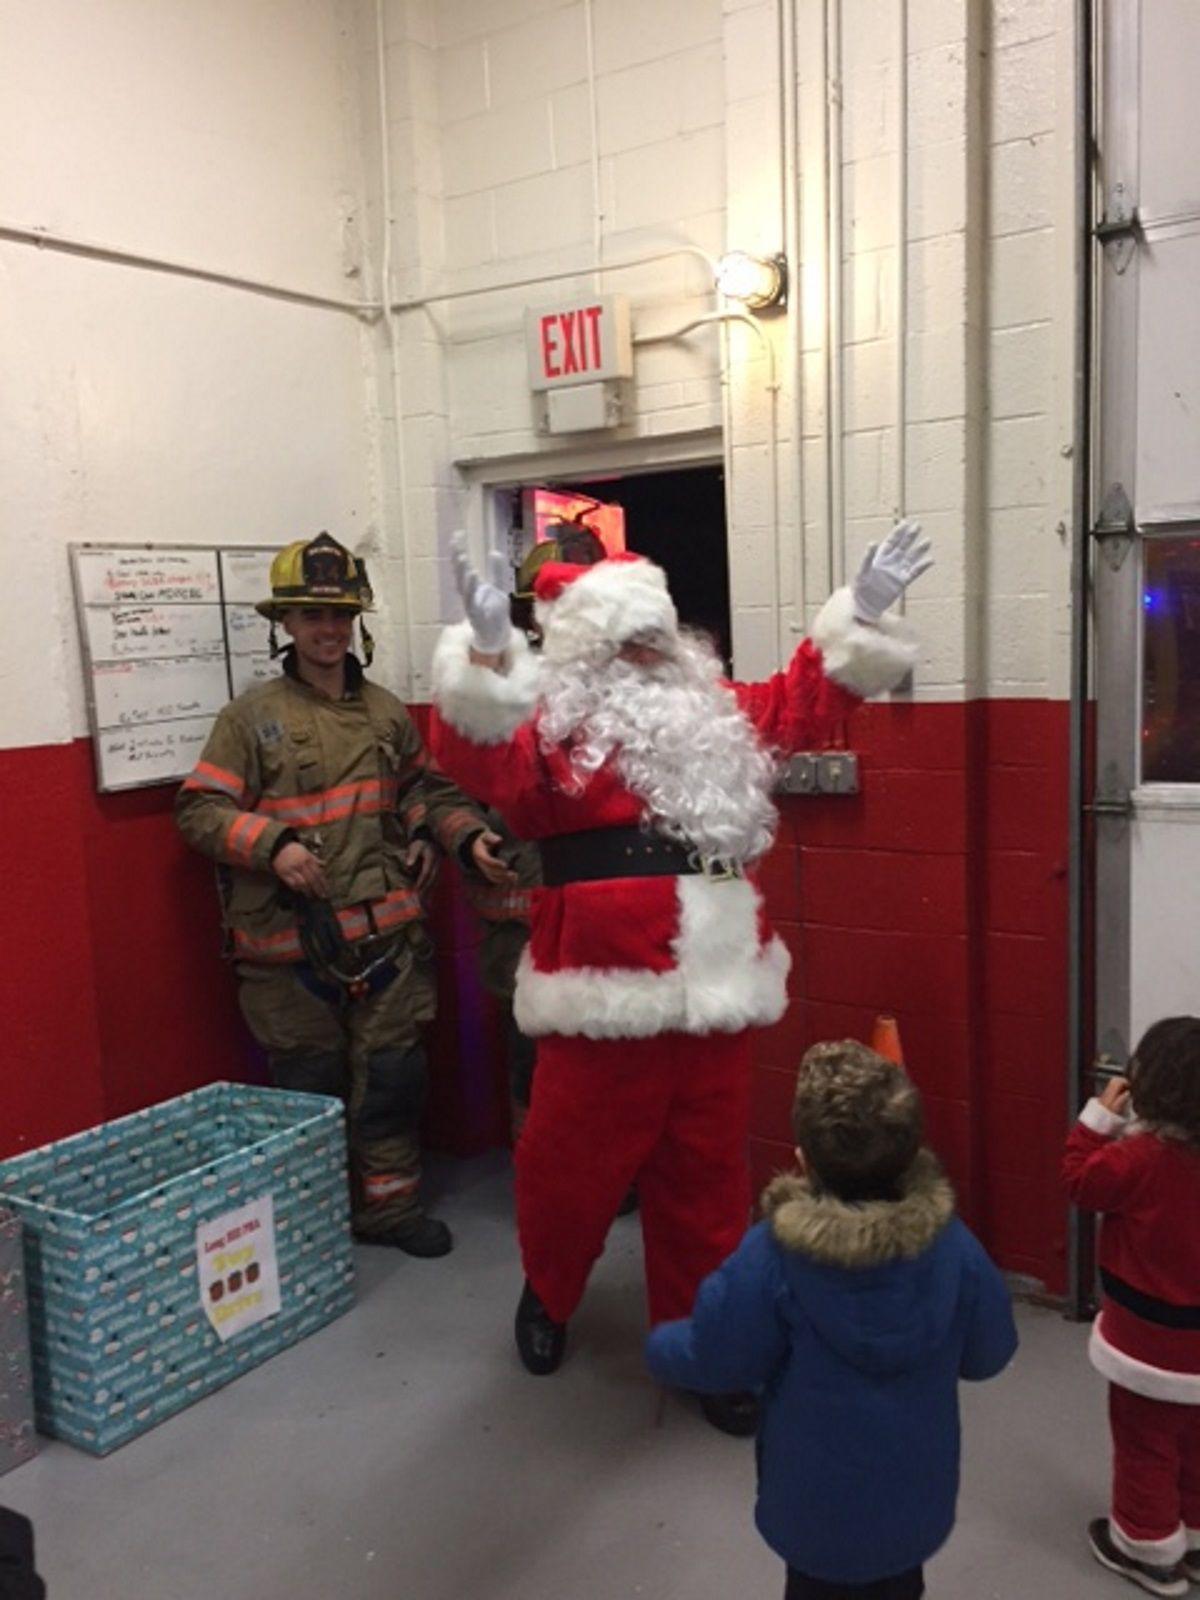 Santa comes to Millington Dec. 14 and 15